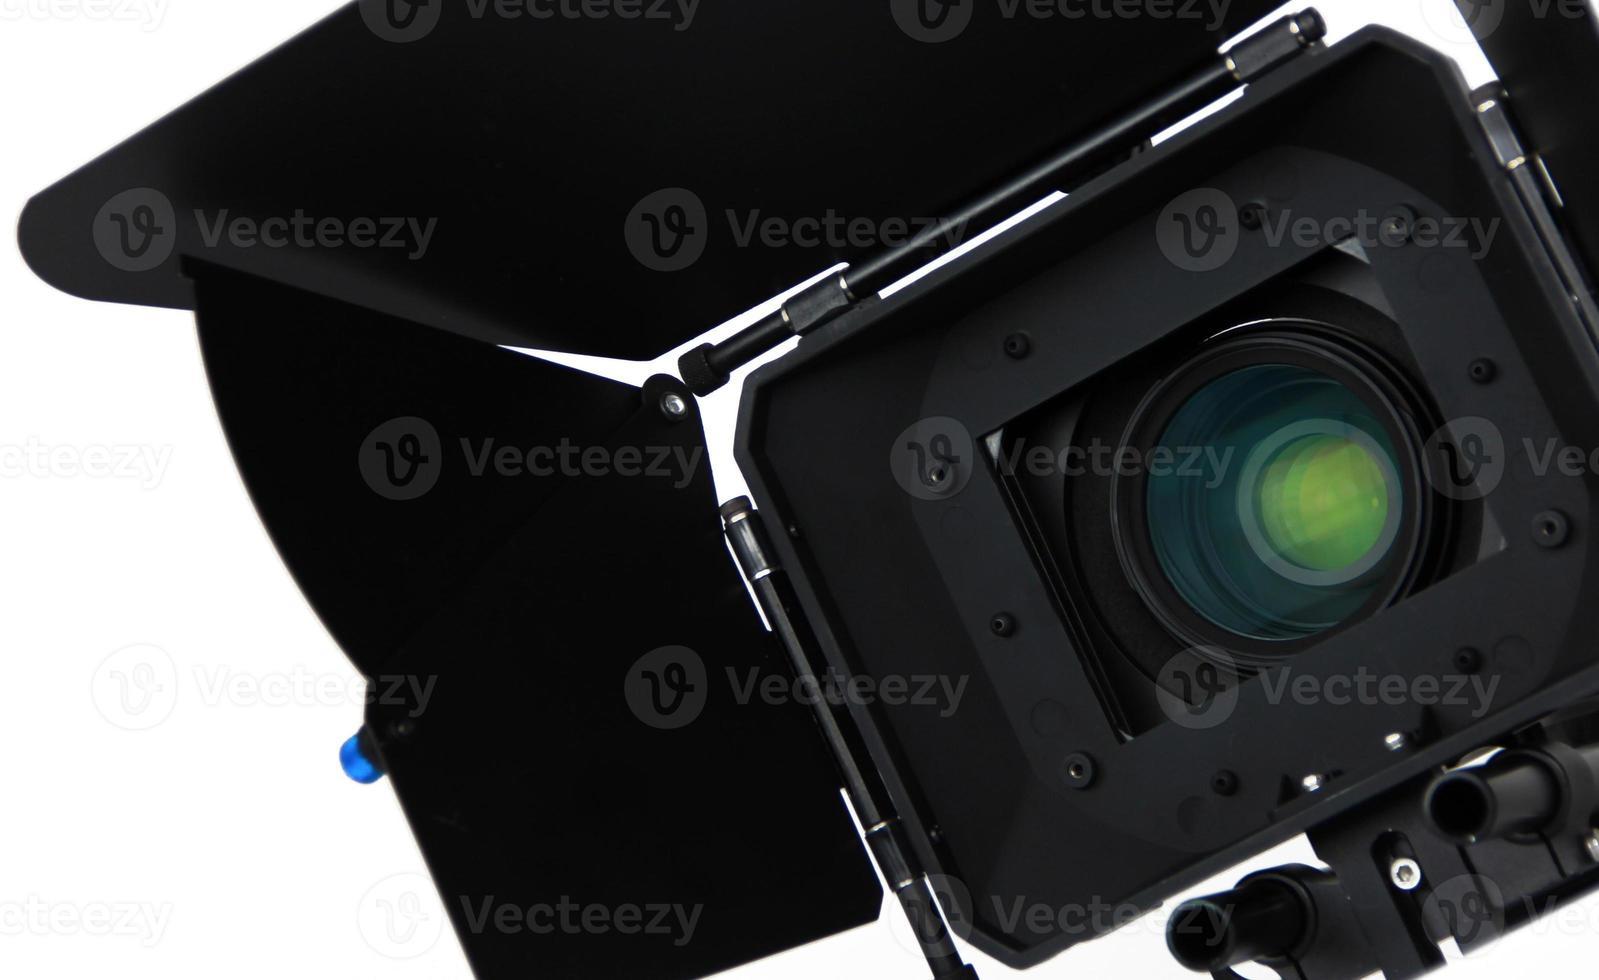 Camera Close-up photo